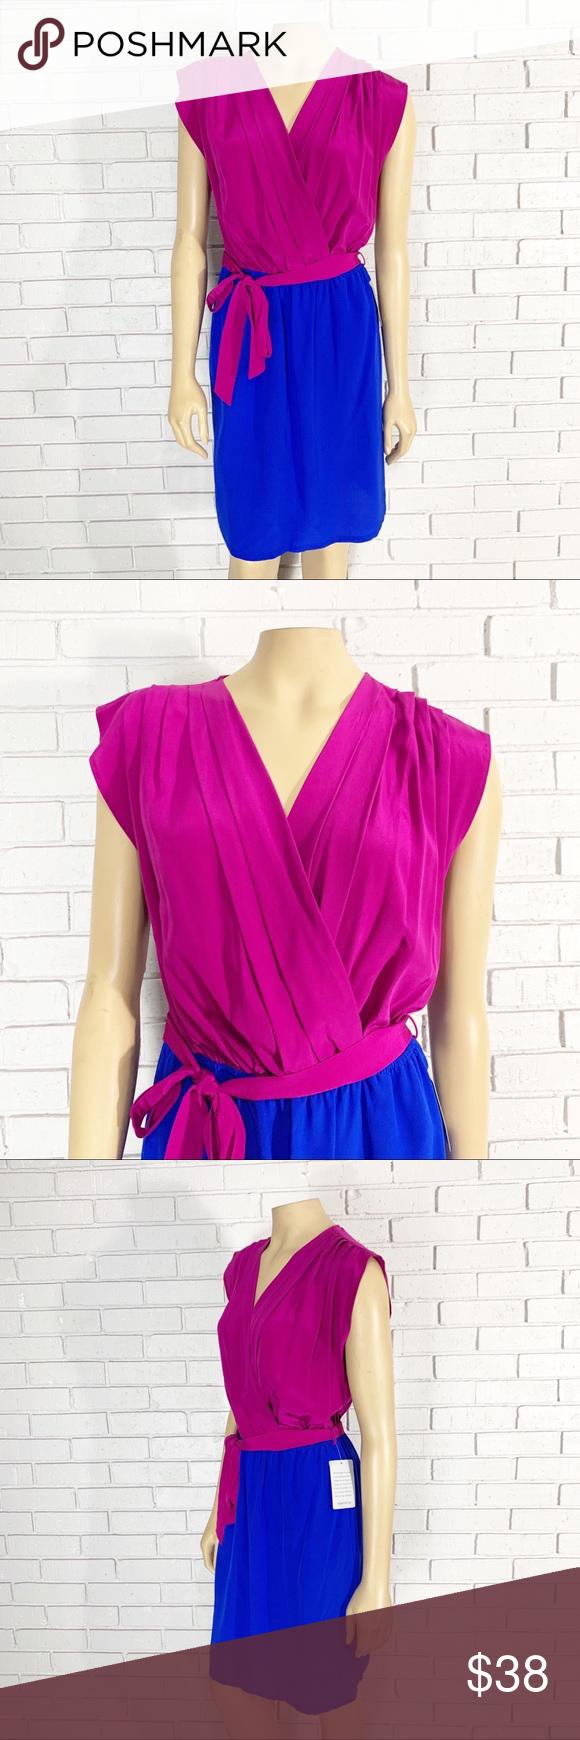 "Presley Skye Women's Silk Colorblock Dress A silk magenta cobalt dress that truly is an attention grabber. Length 34"". Armpit to armpit measurement lying flat 19"". Presley Skye Dresses #cobaltdress"